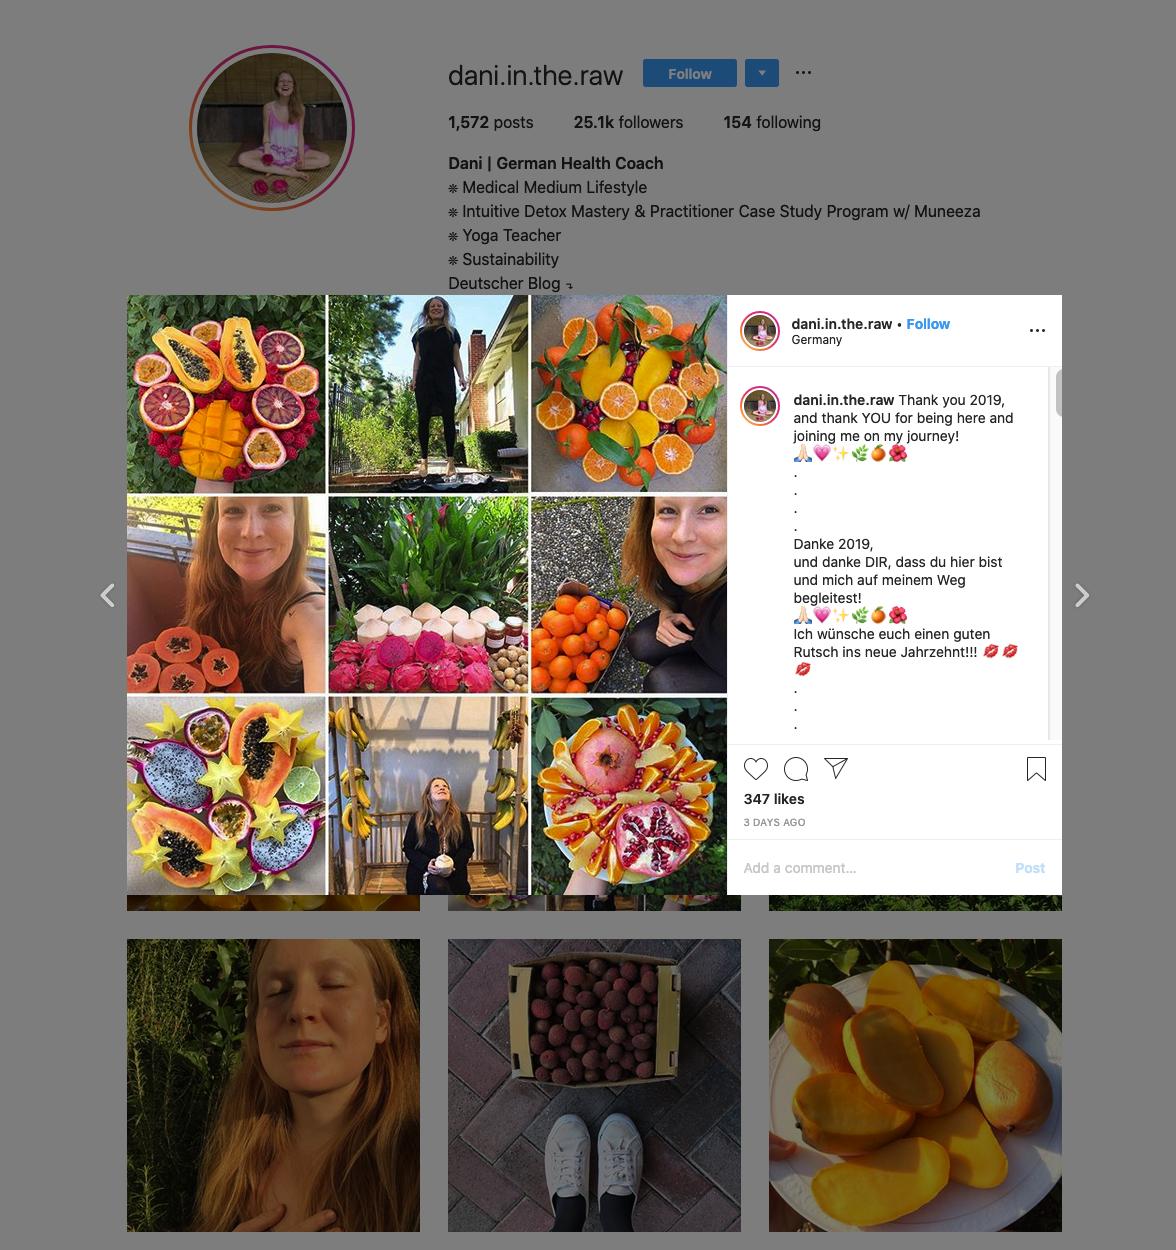 Dani | German Health Coach | Instagram Profile